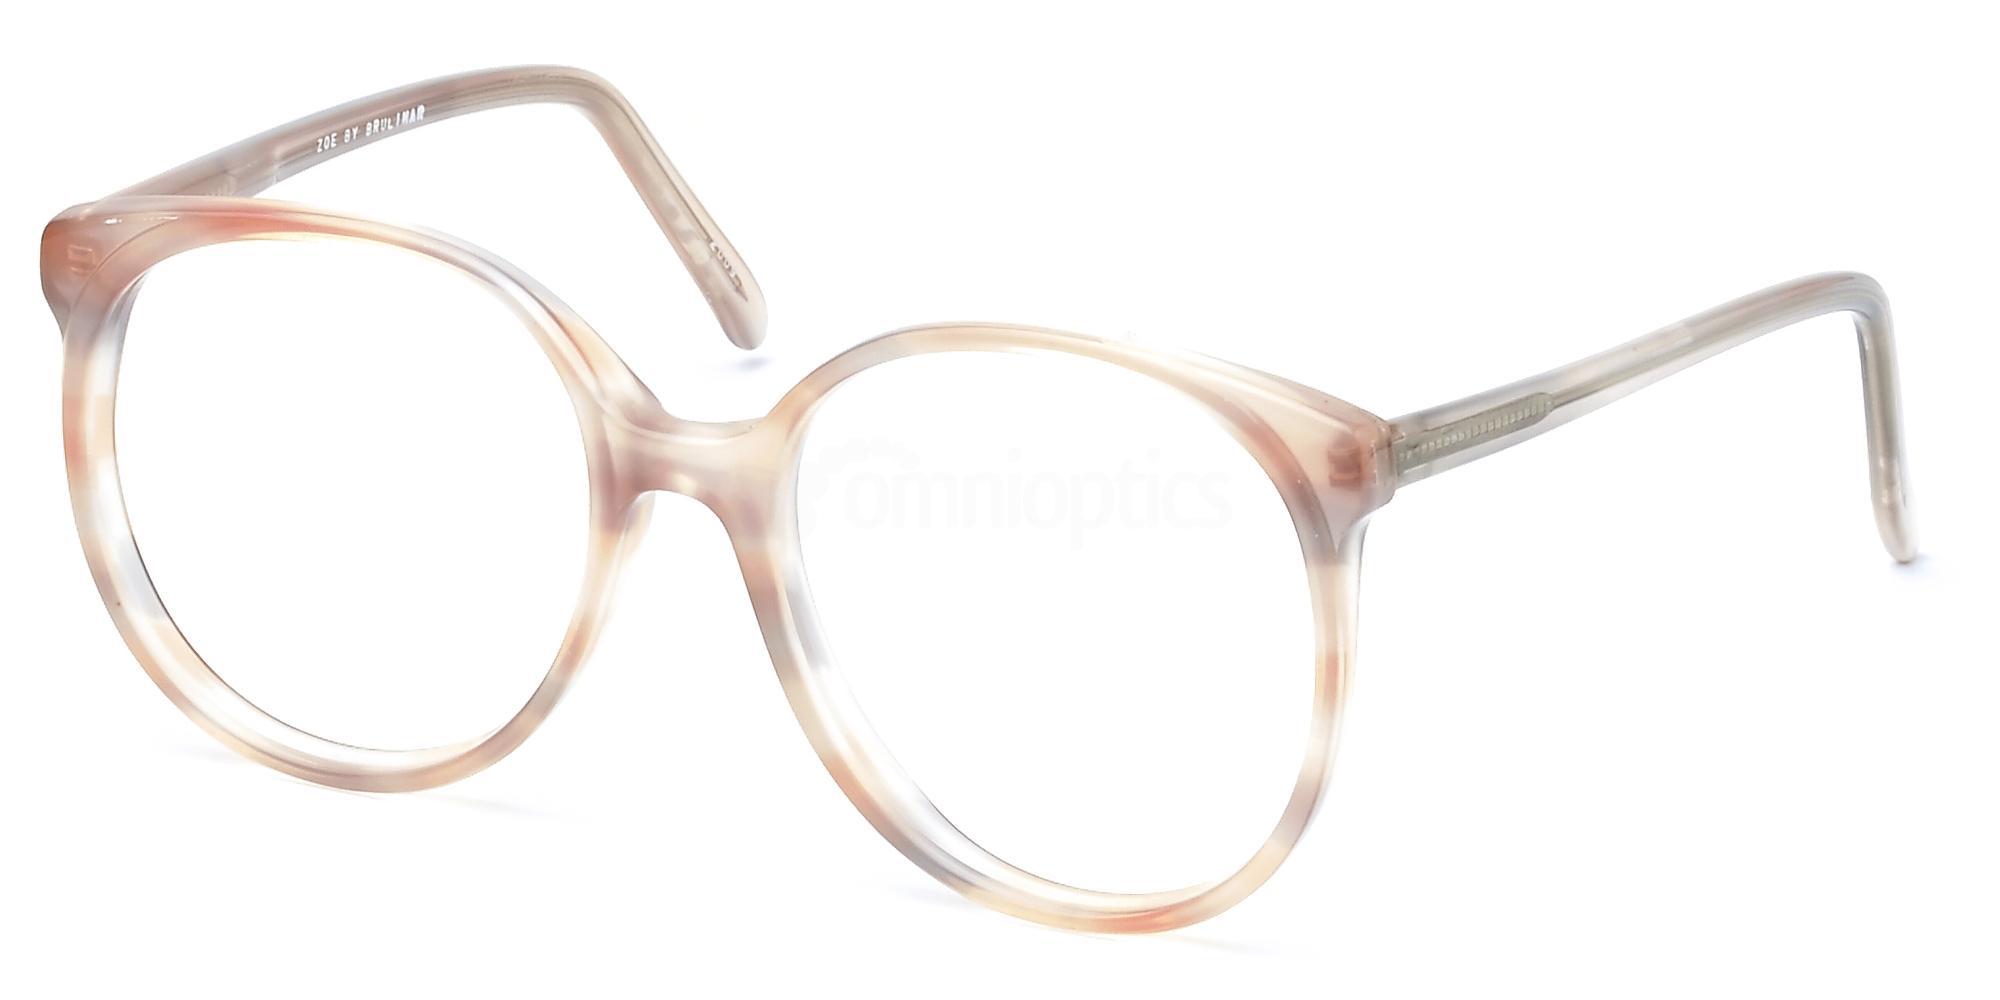 C9 ZOE2009 Glasses, Zoe Vintage